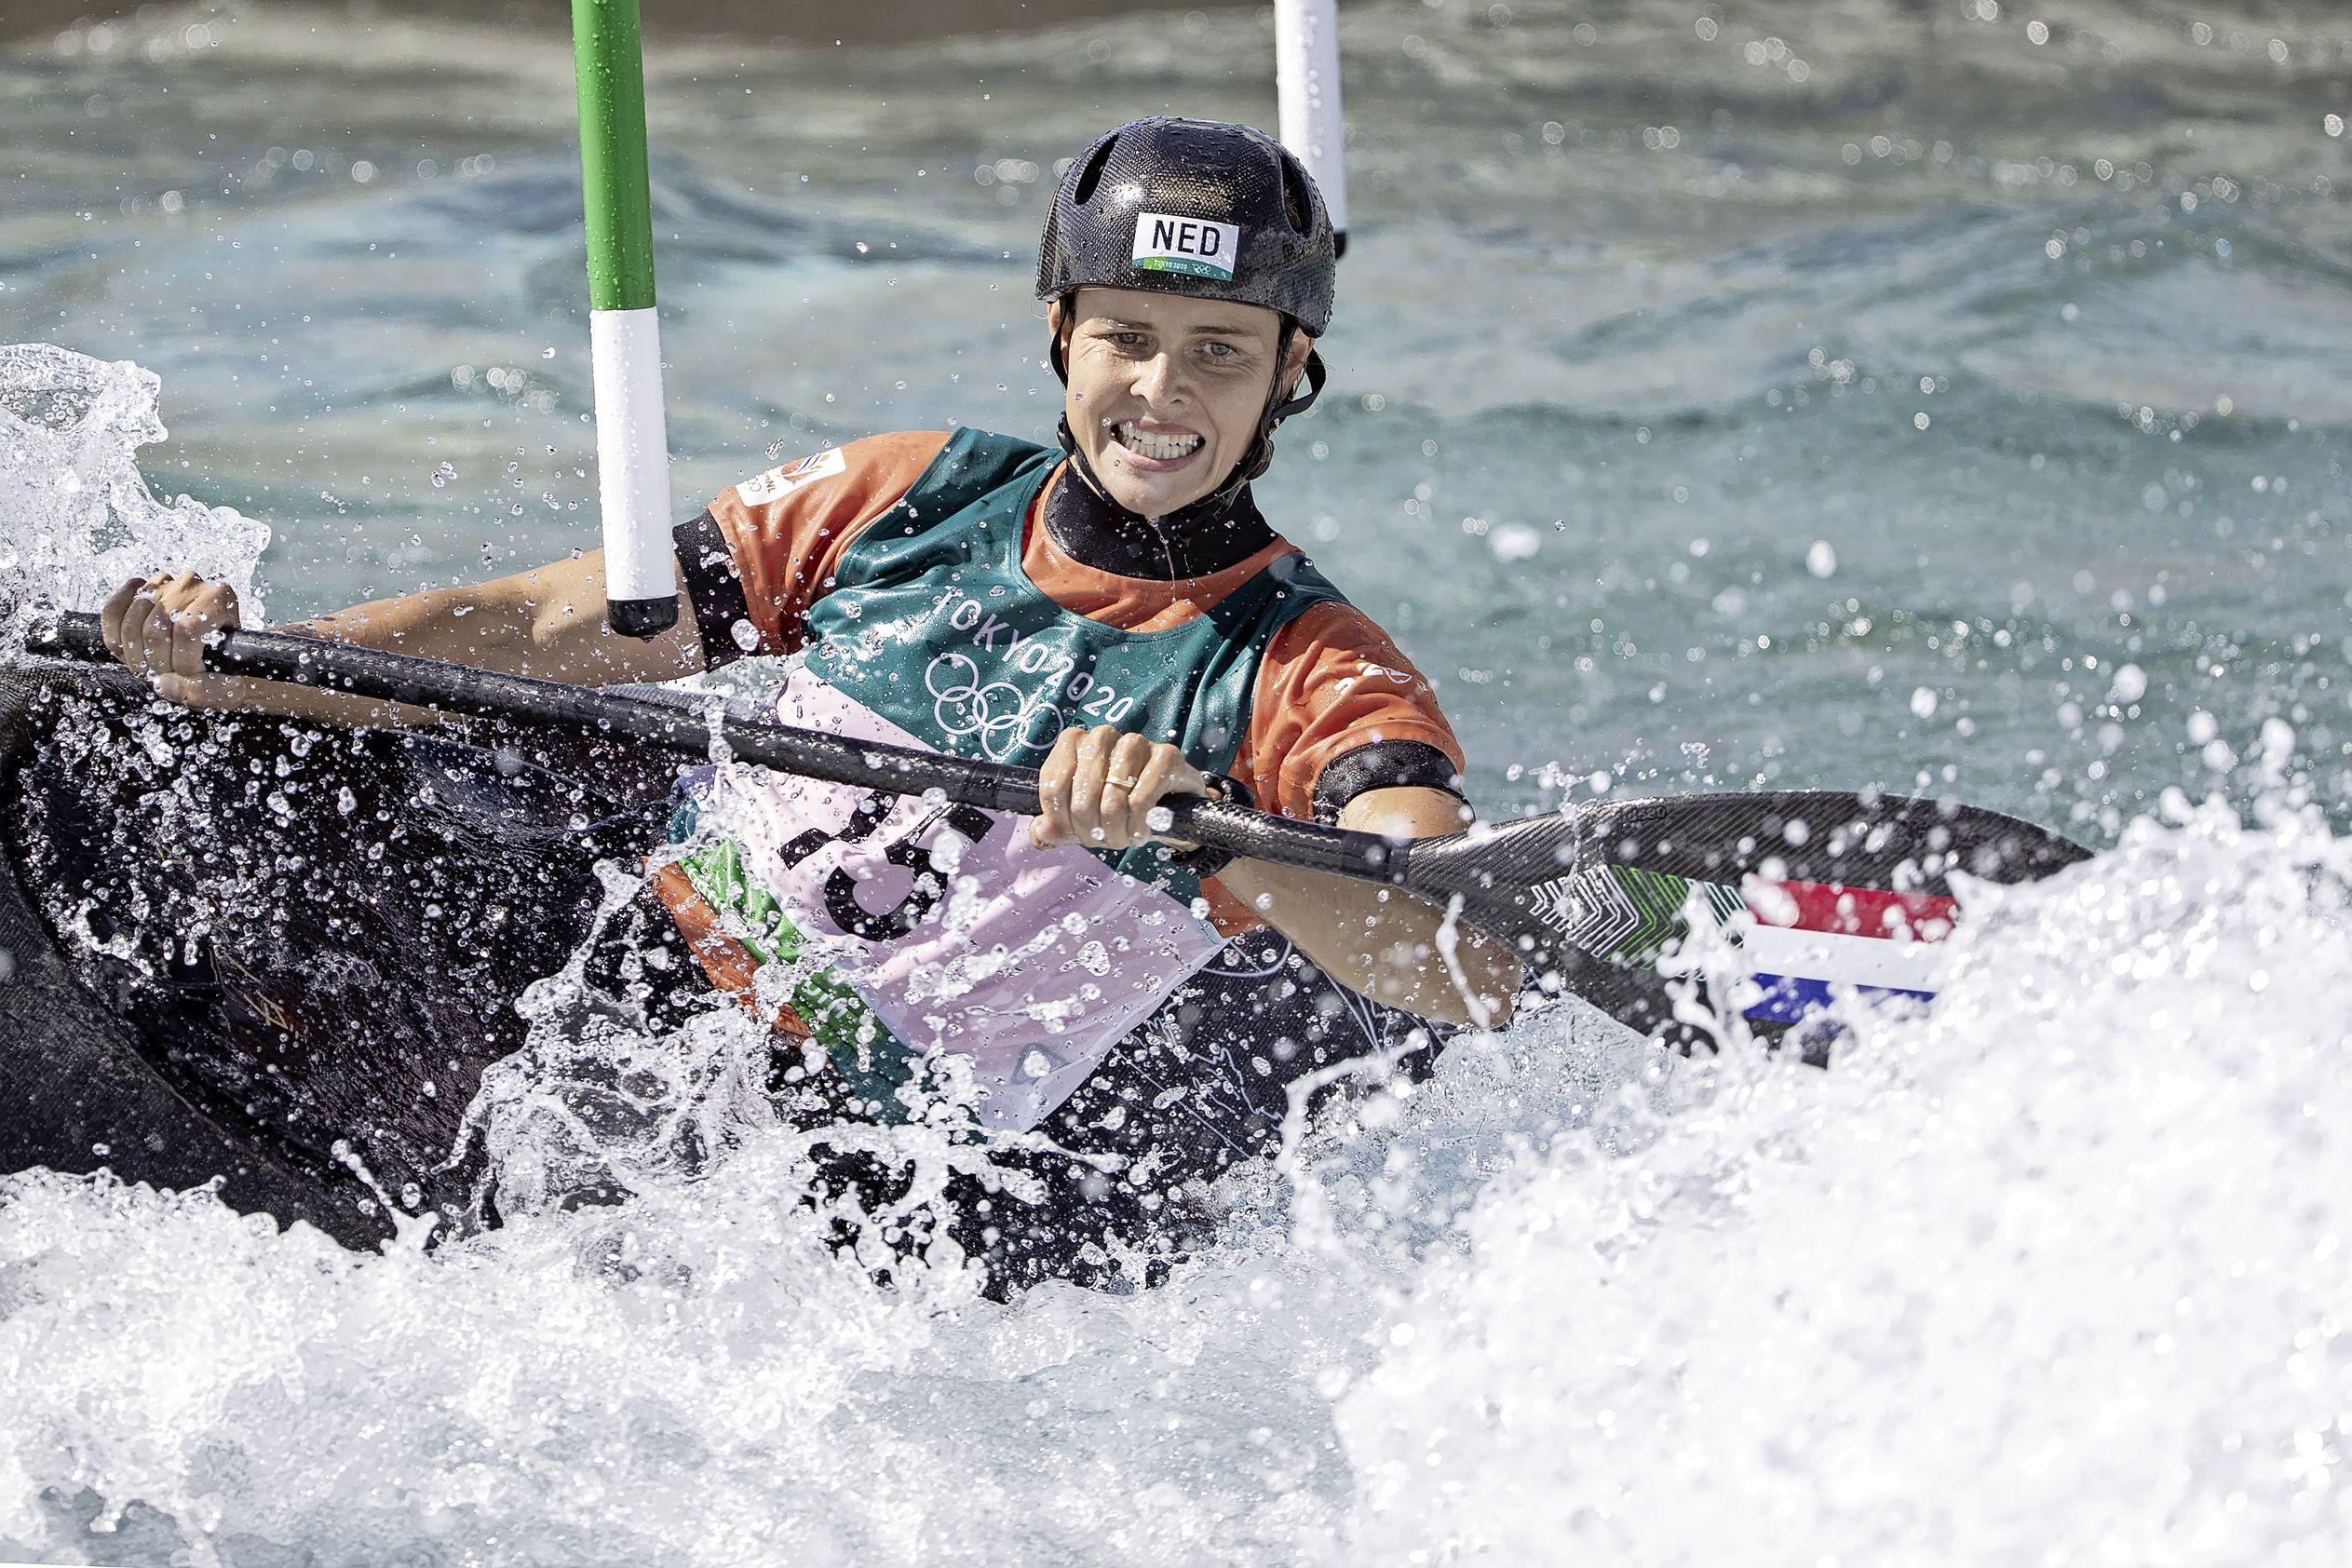 Kanovaarster Wegman eindigt als zevende in olympische finale